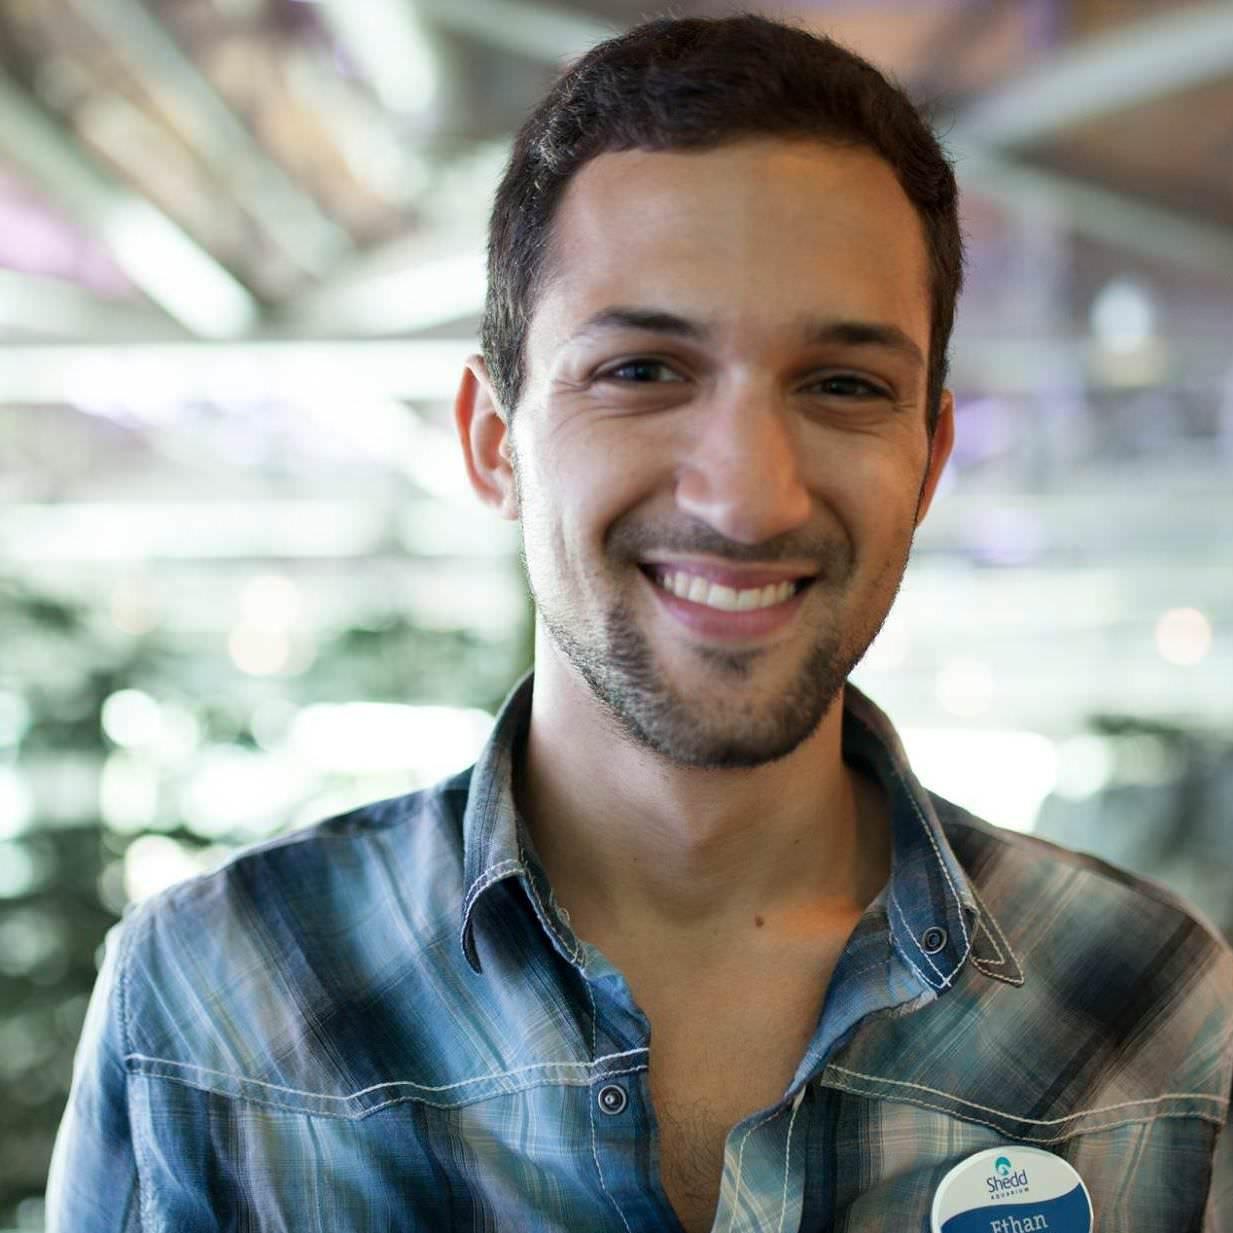 Ethan Saltzberg - Videographer, Editor